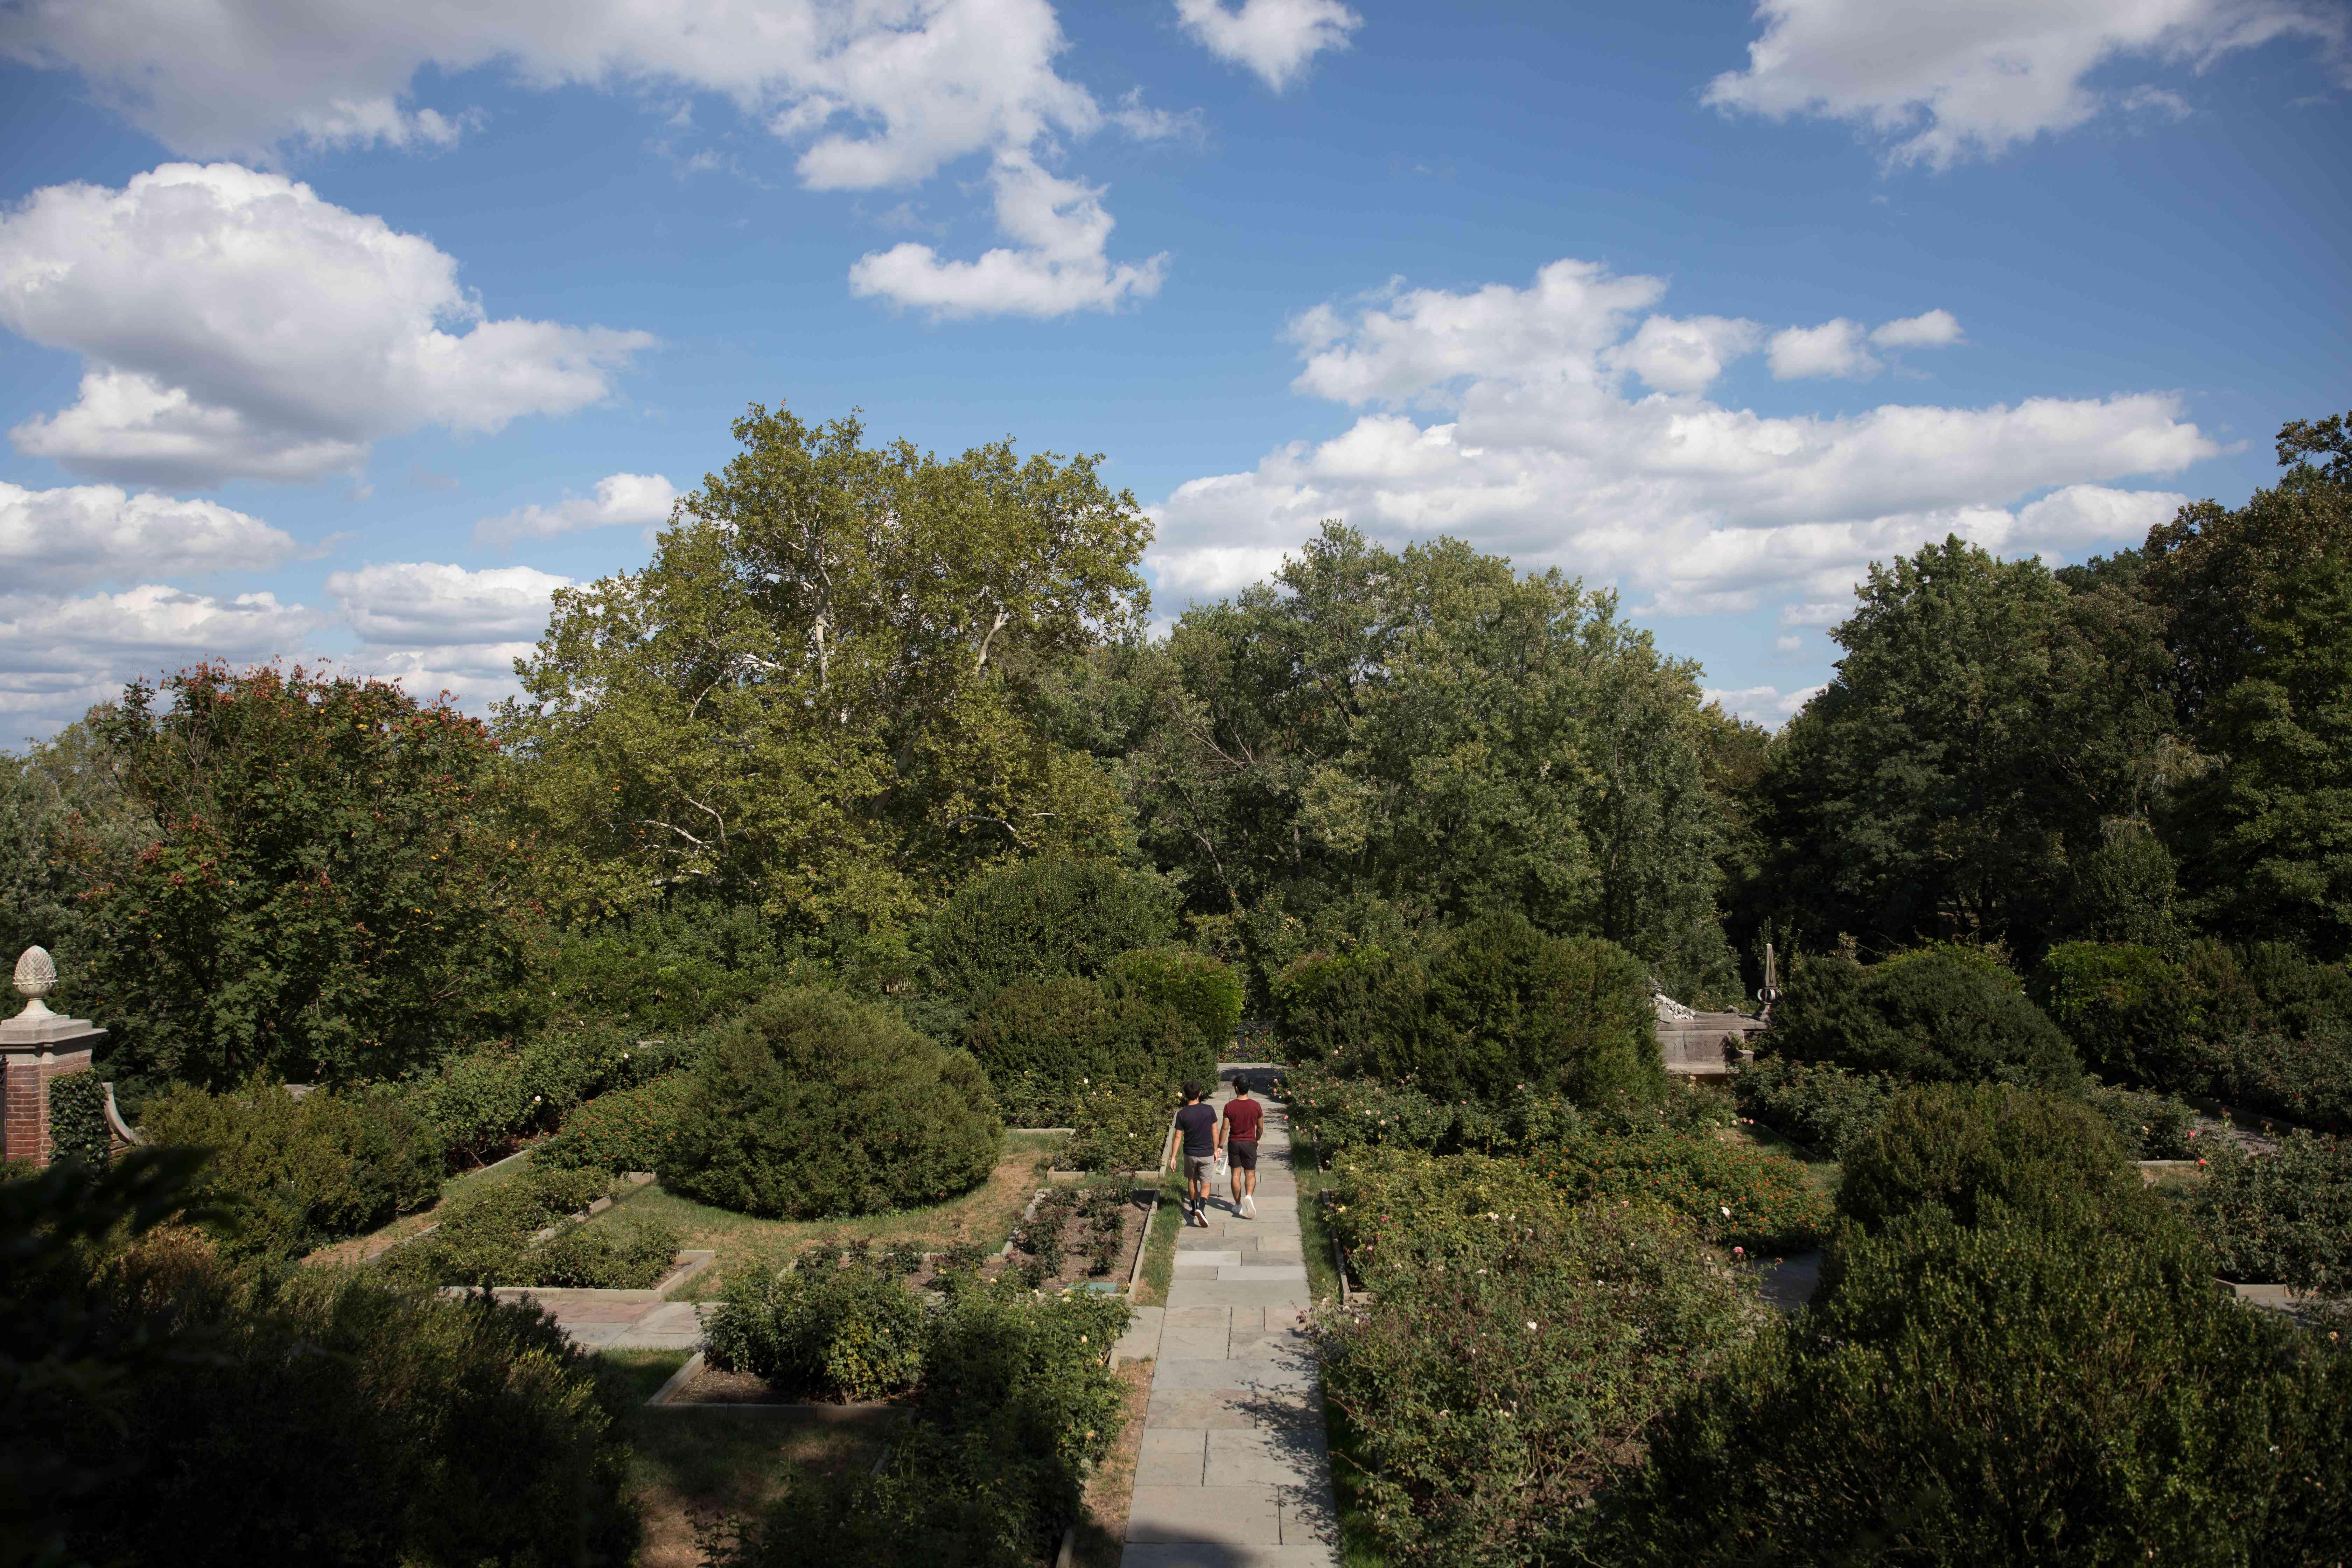 Two people walking through the gardens at Dumbarton Oaks